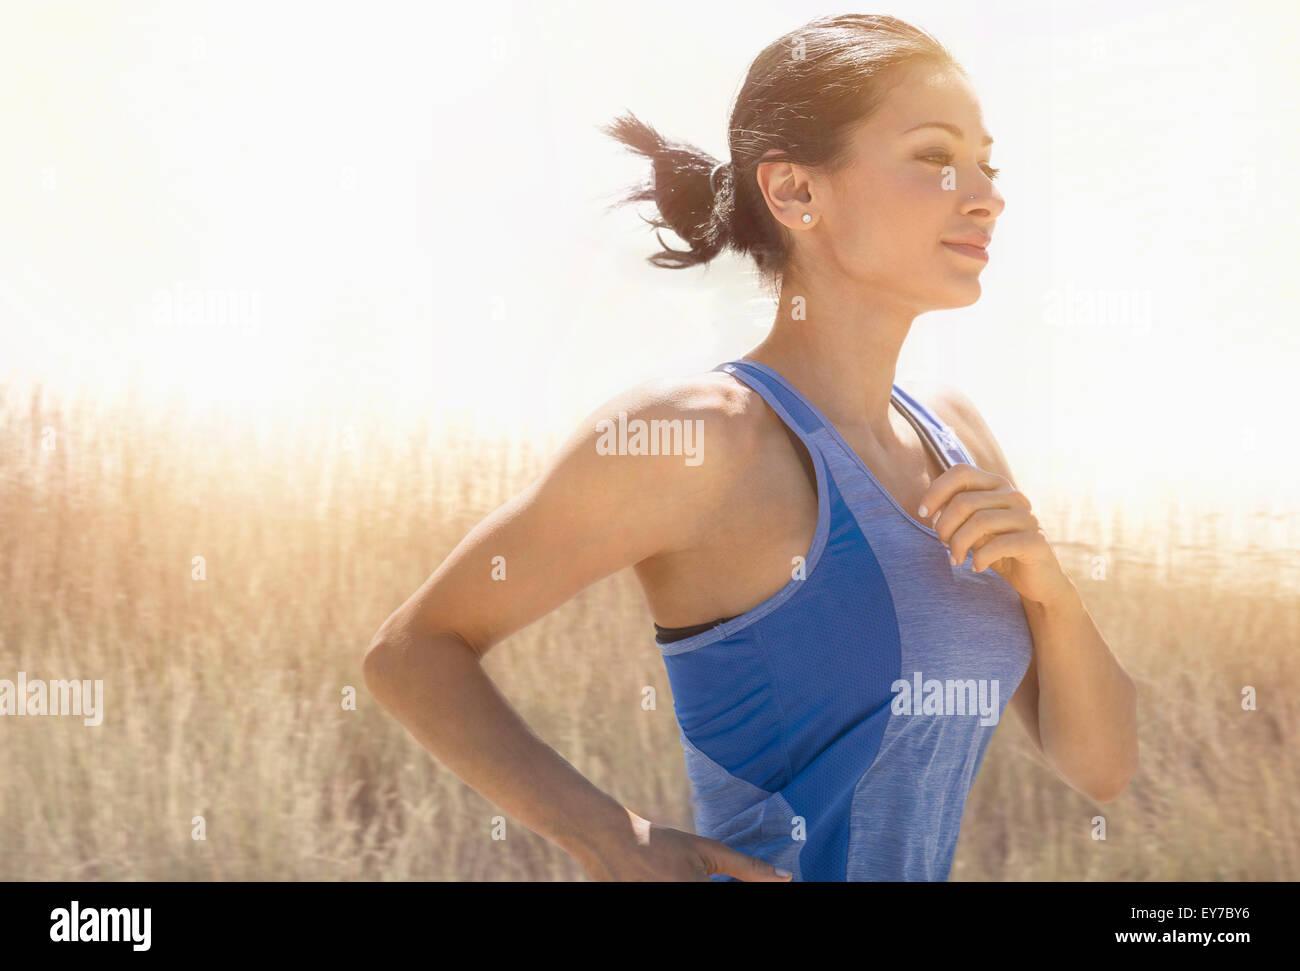 Mujer joven corriendo en exteriores Imagen De Stock